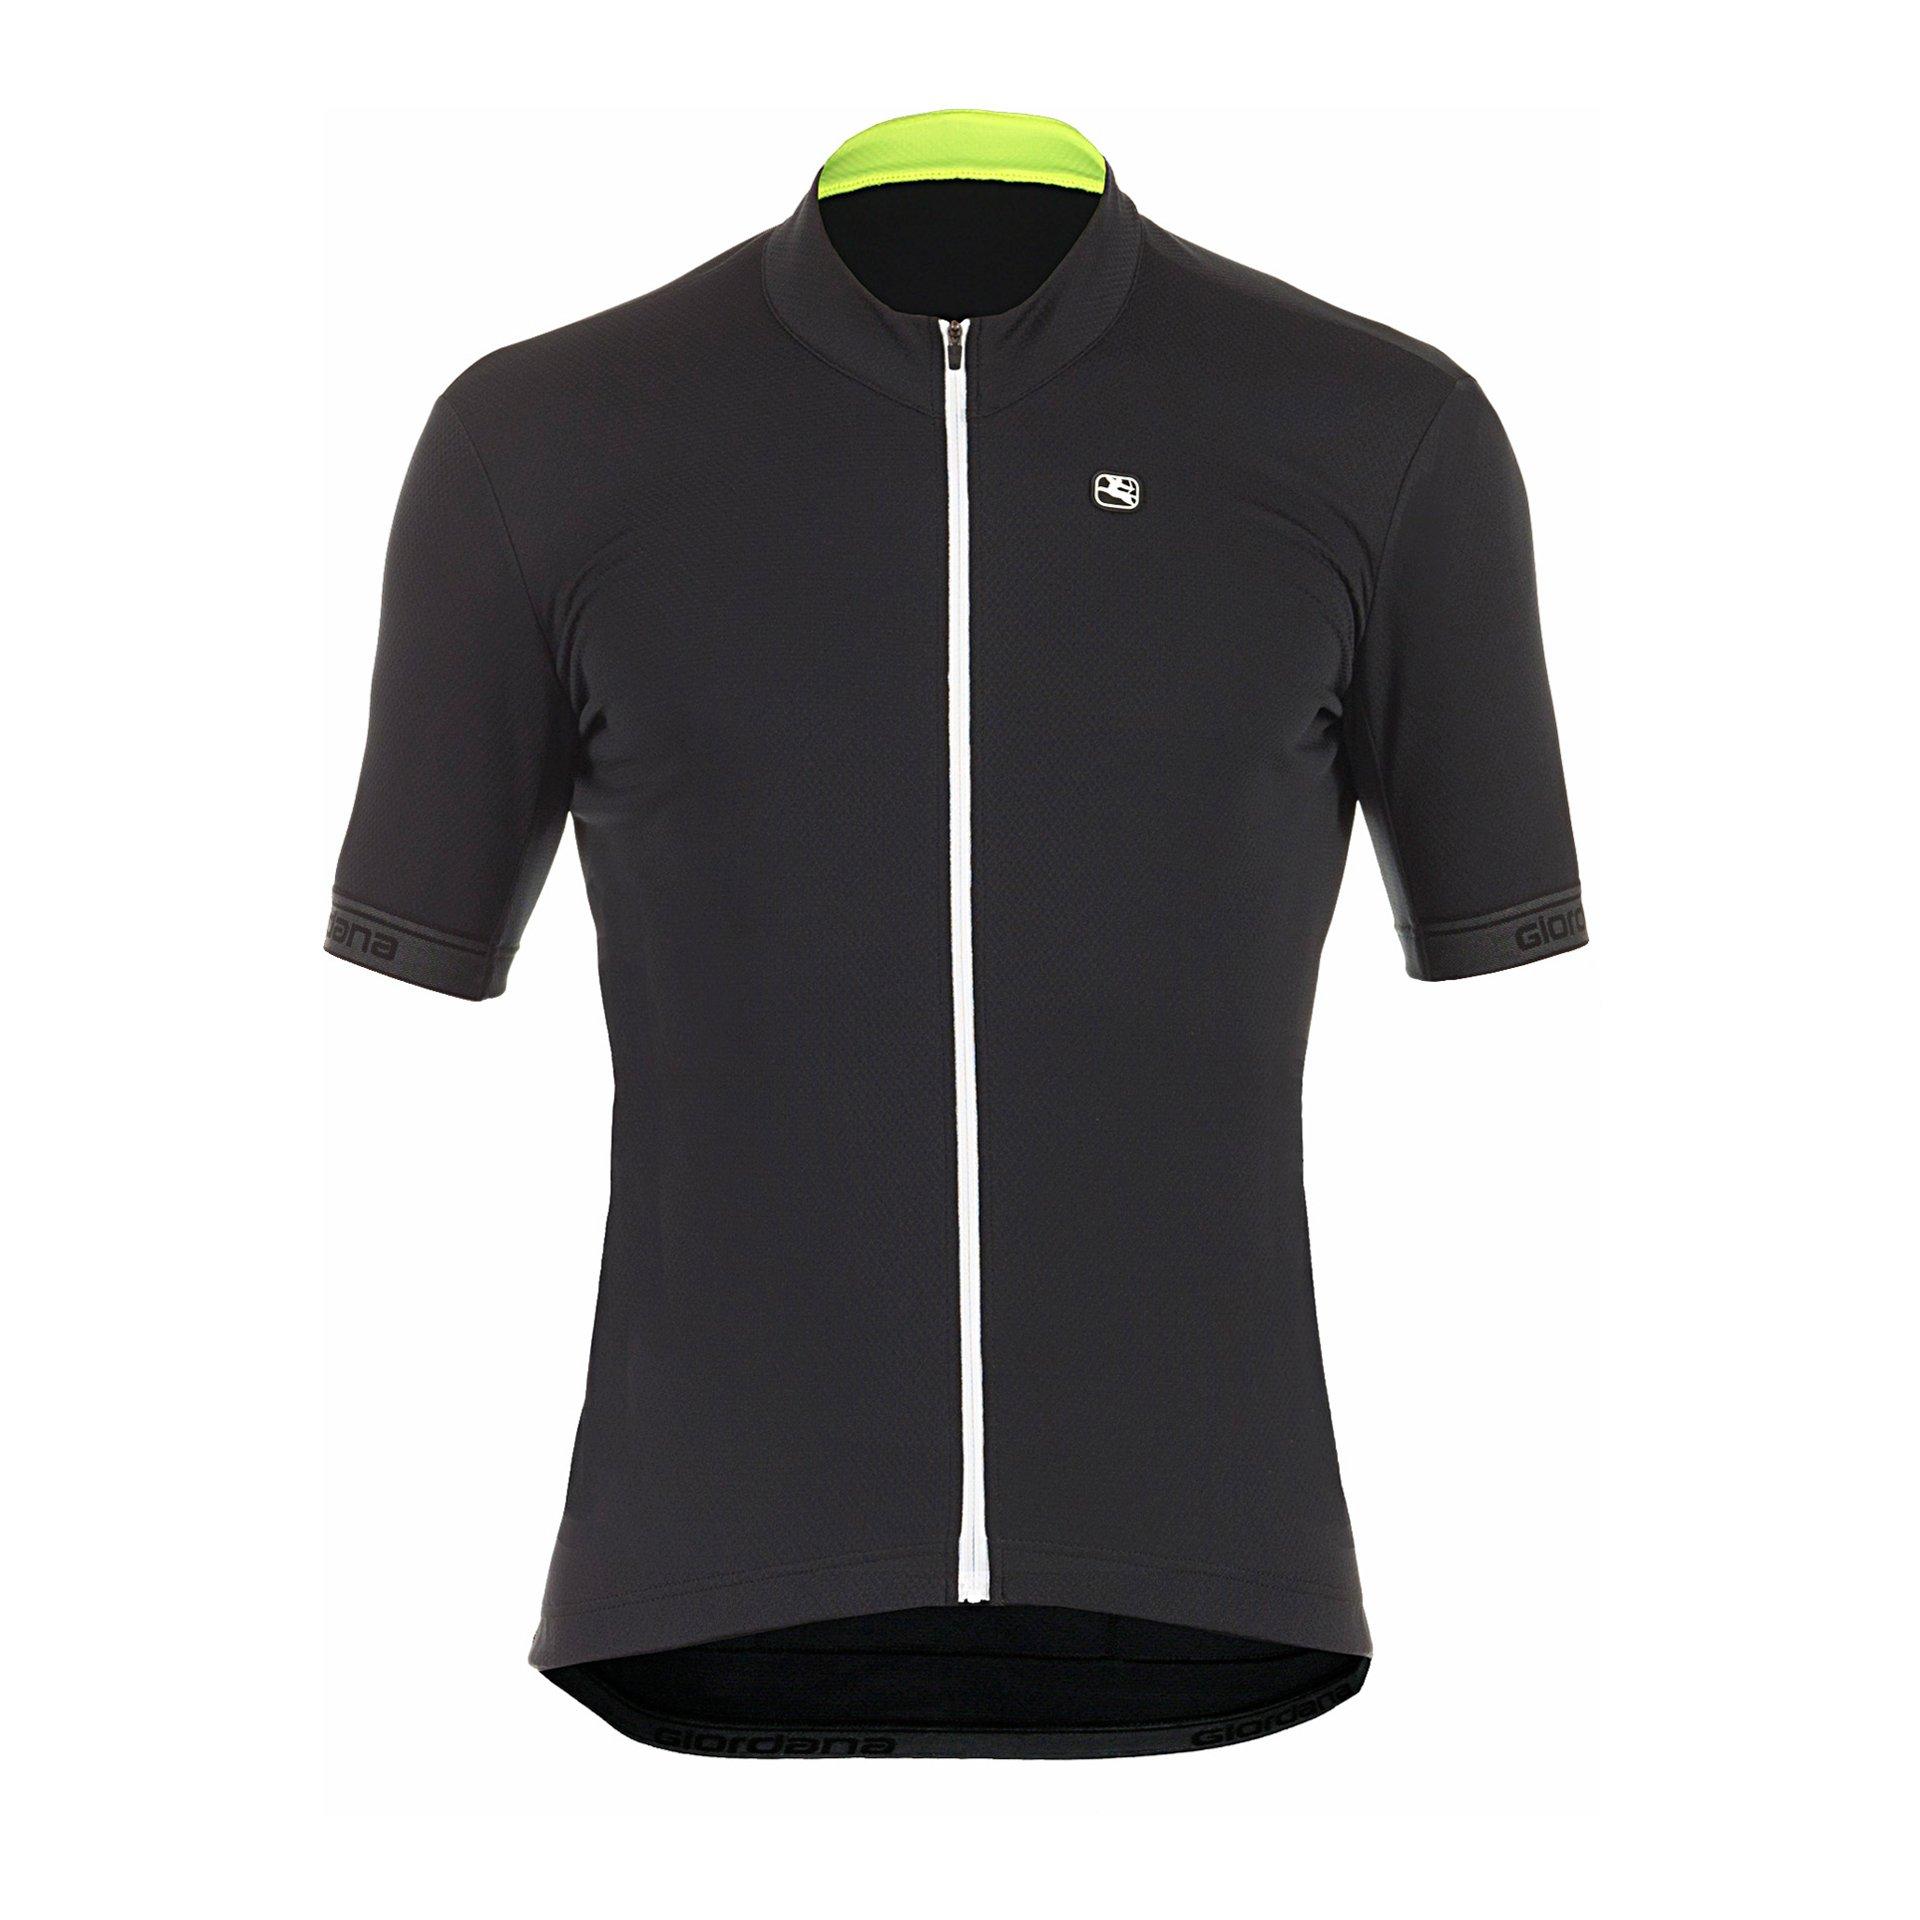 Giordana Fusion kortærmet trøje sort | Trøjer